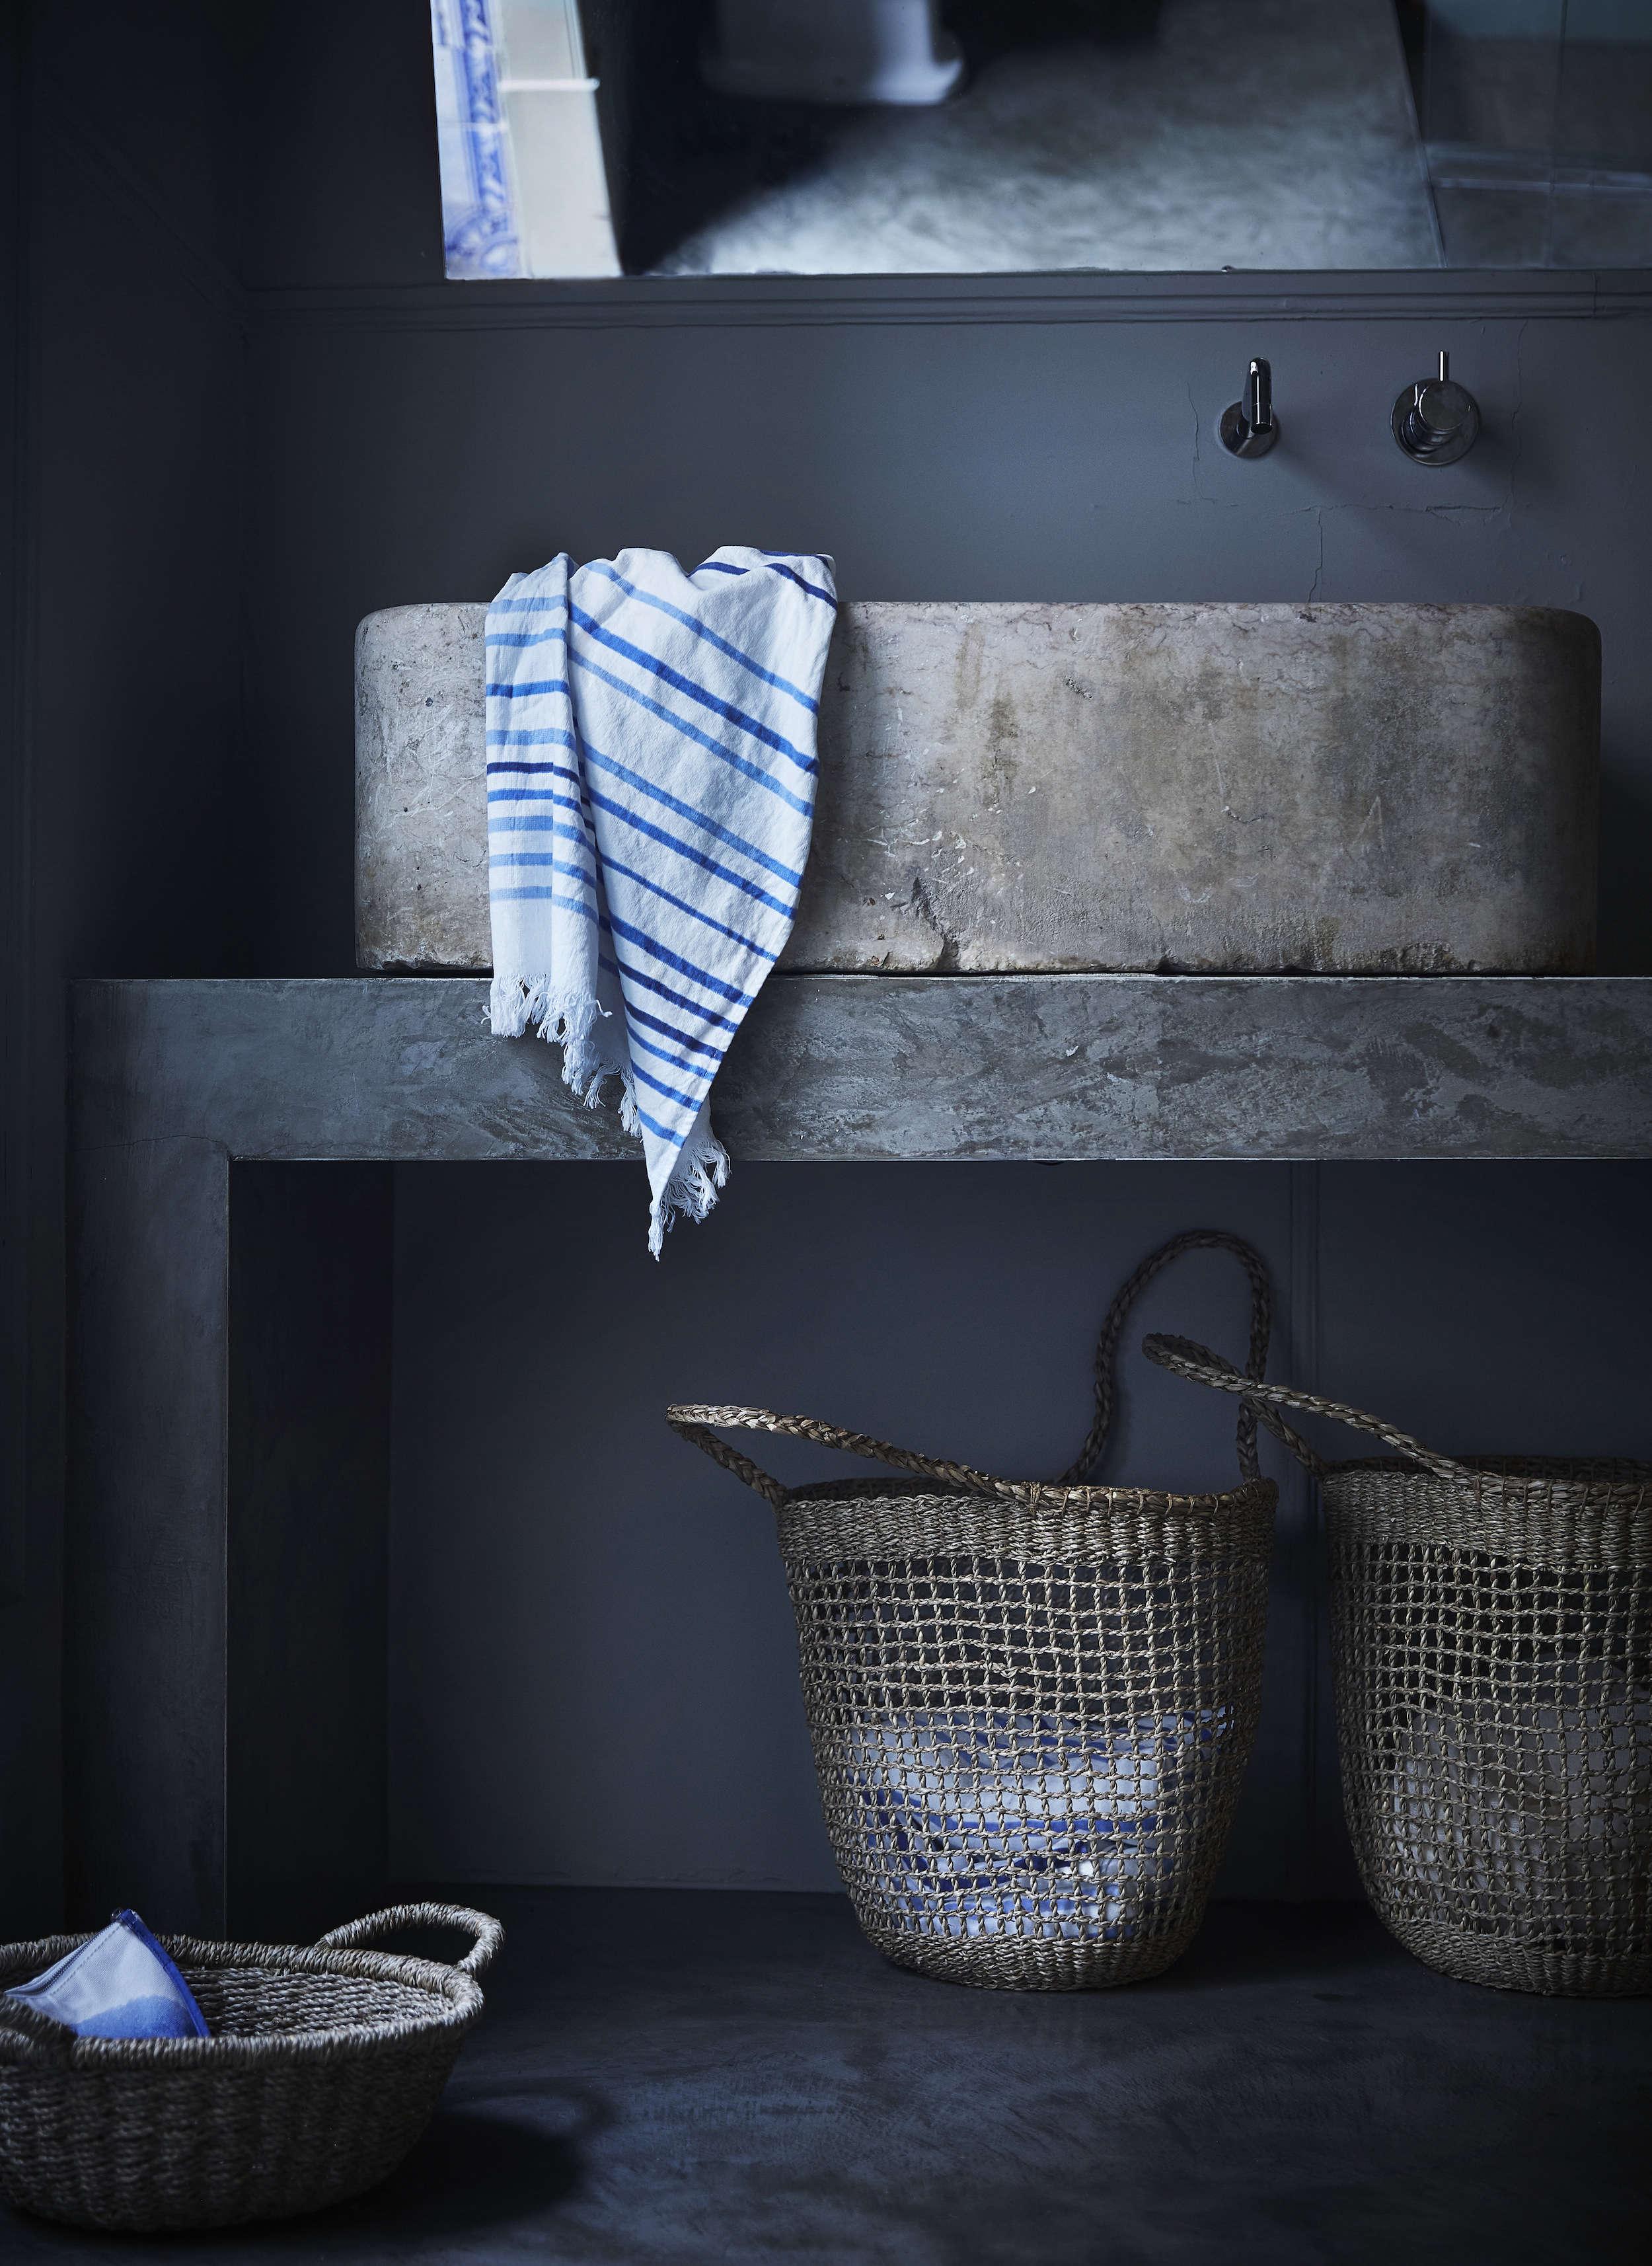 Ikea Tankvard Seagrass Basket with Handles